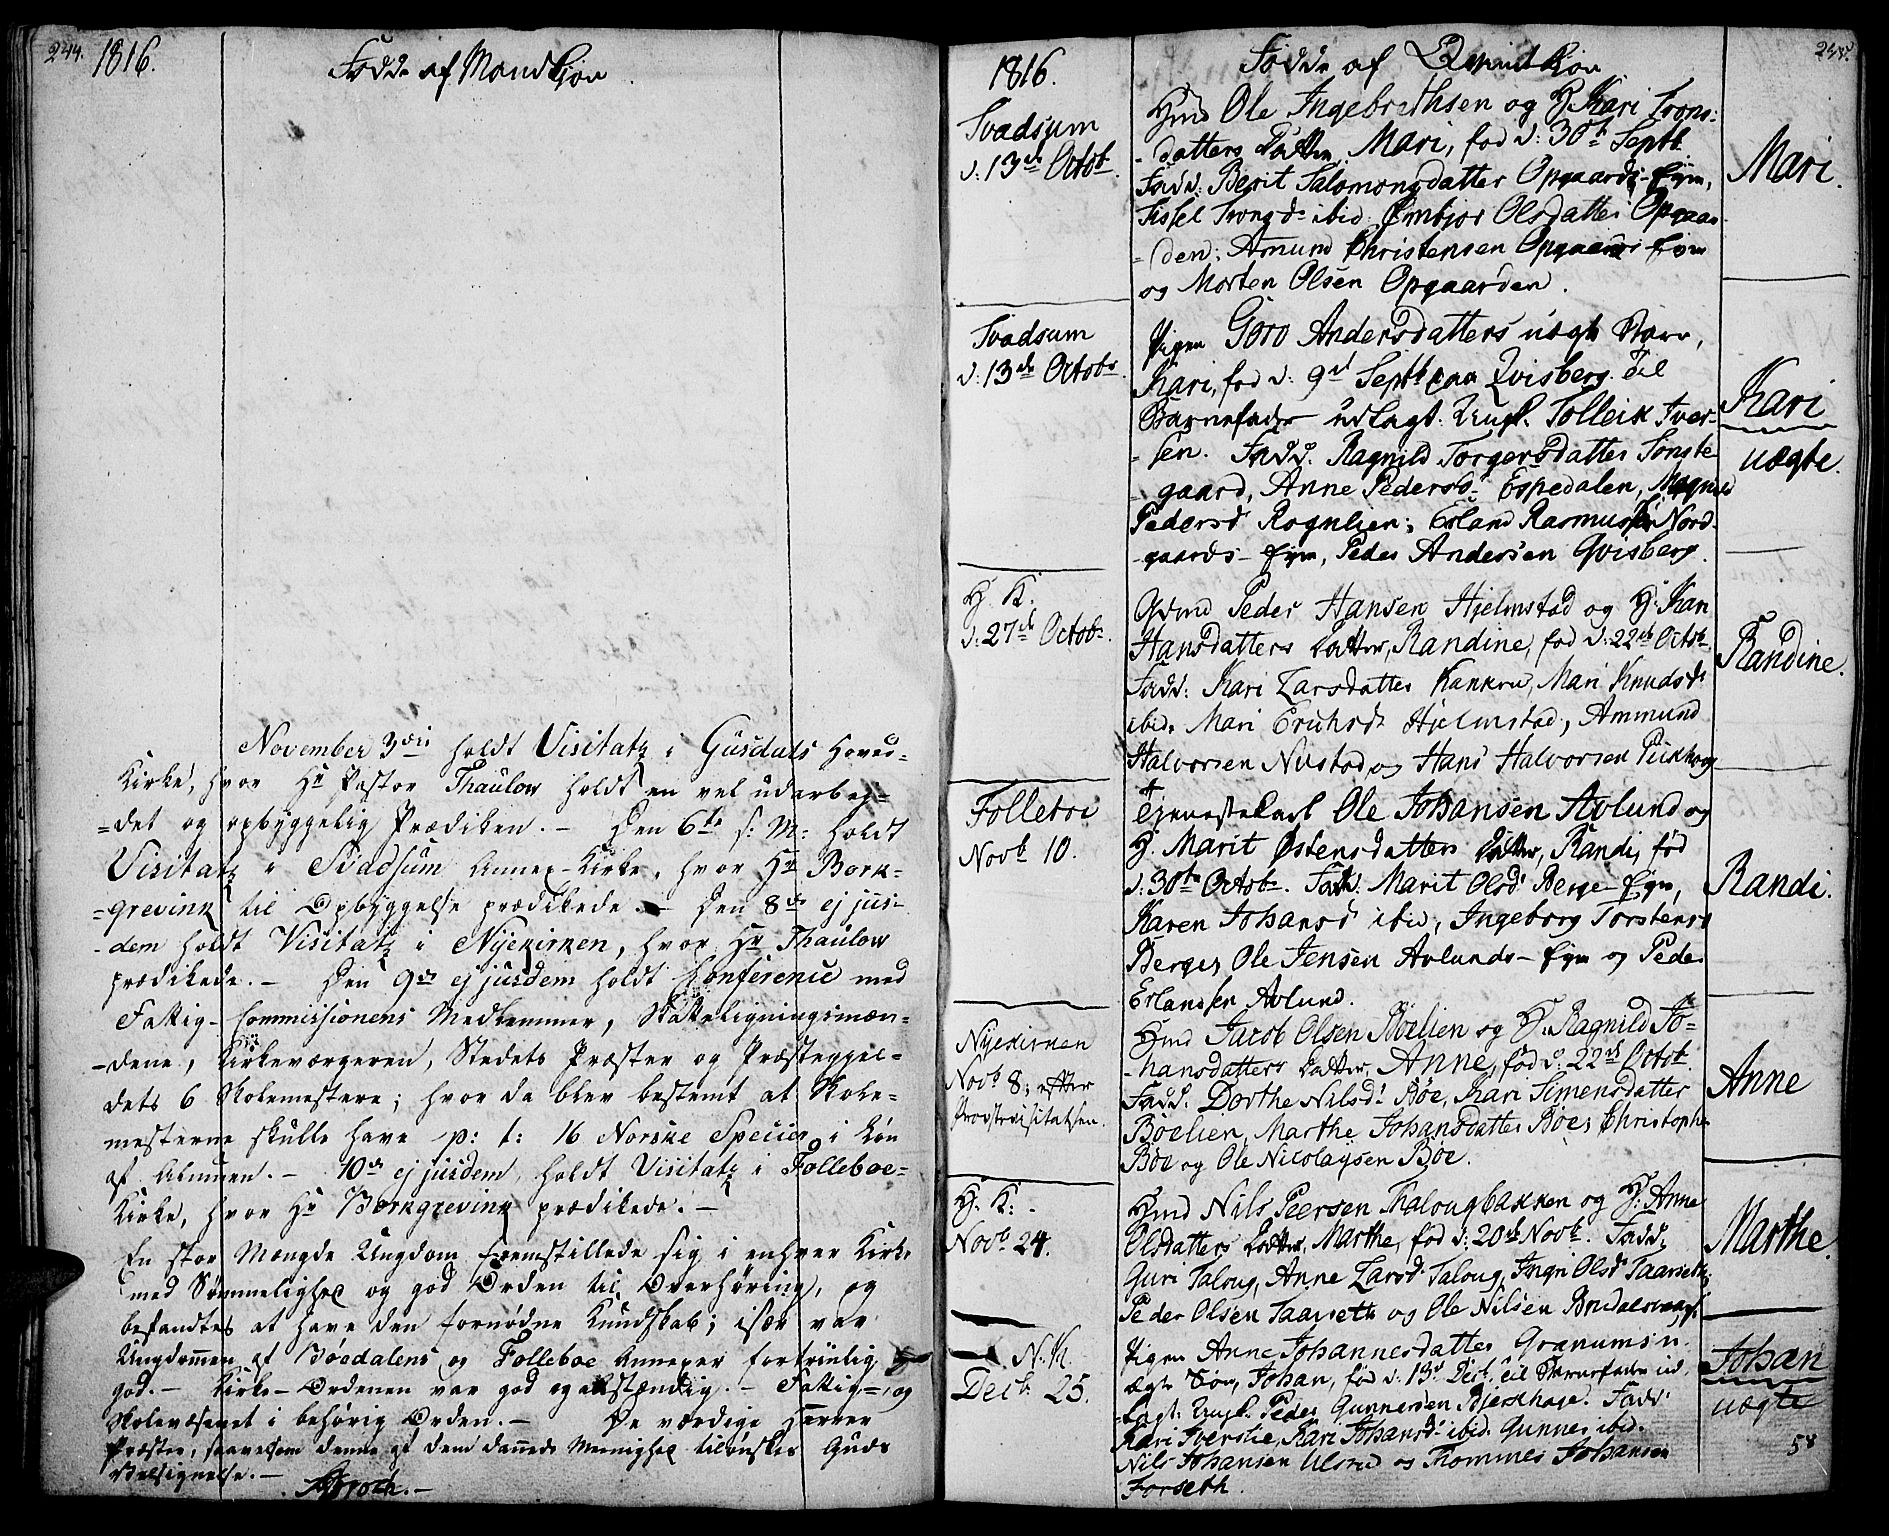 SAH, Gausdal prestekontor, Ministerialbok nr. 4, 1809-1817, s. 244-245